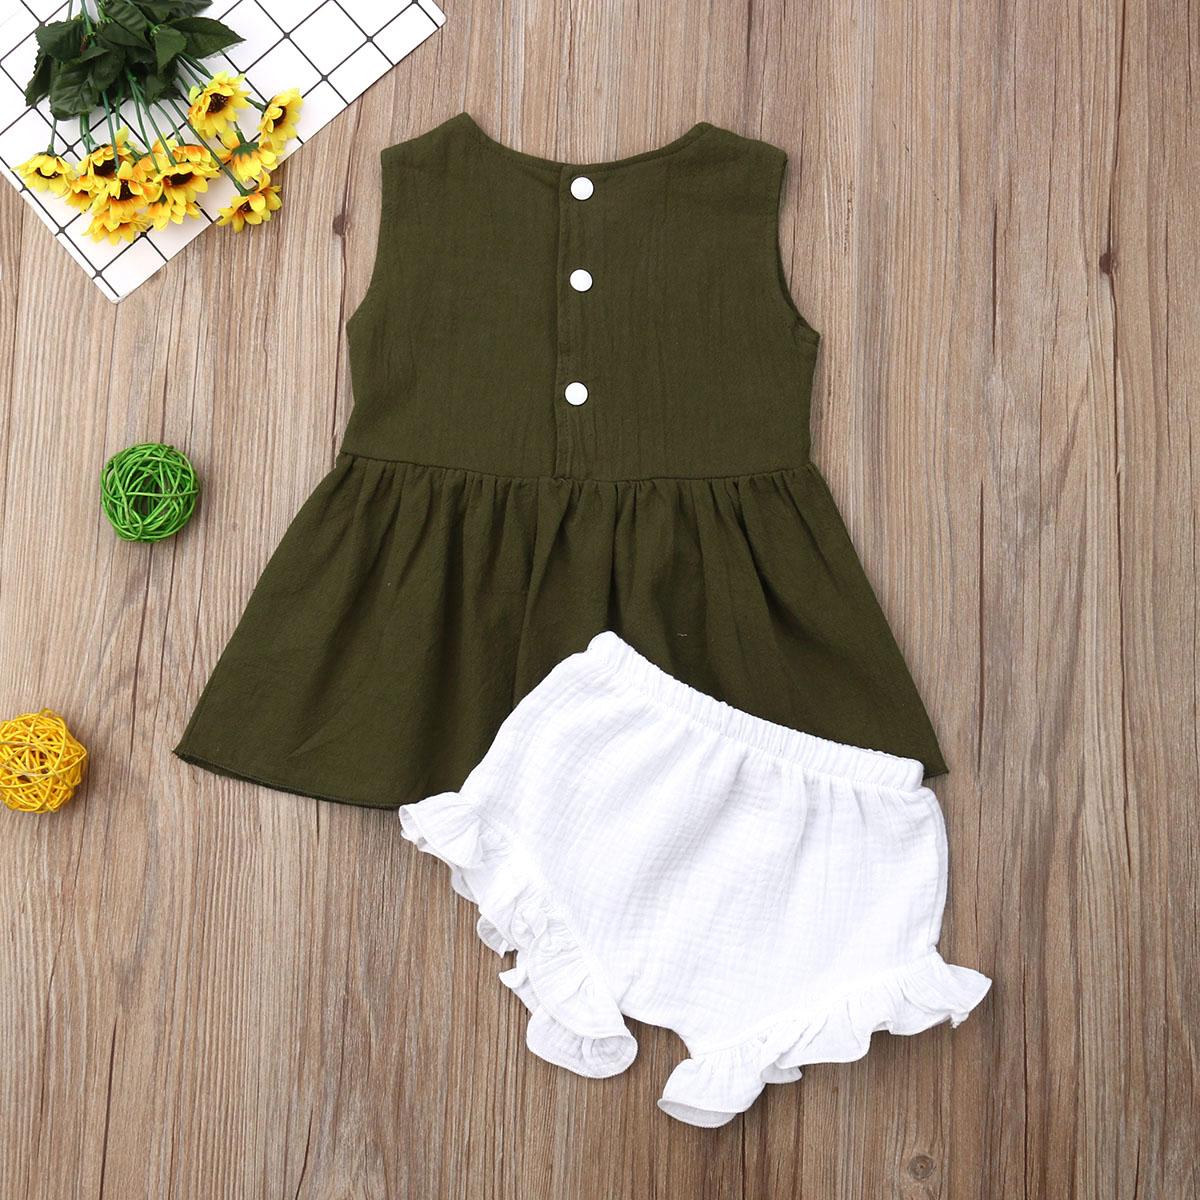 2PCS Baby Kids Girls Summer Outfits Toddler Top Shirt Pants Shorts Clothes Set